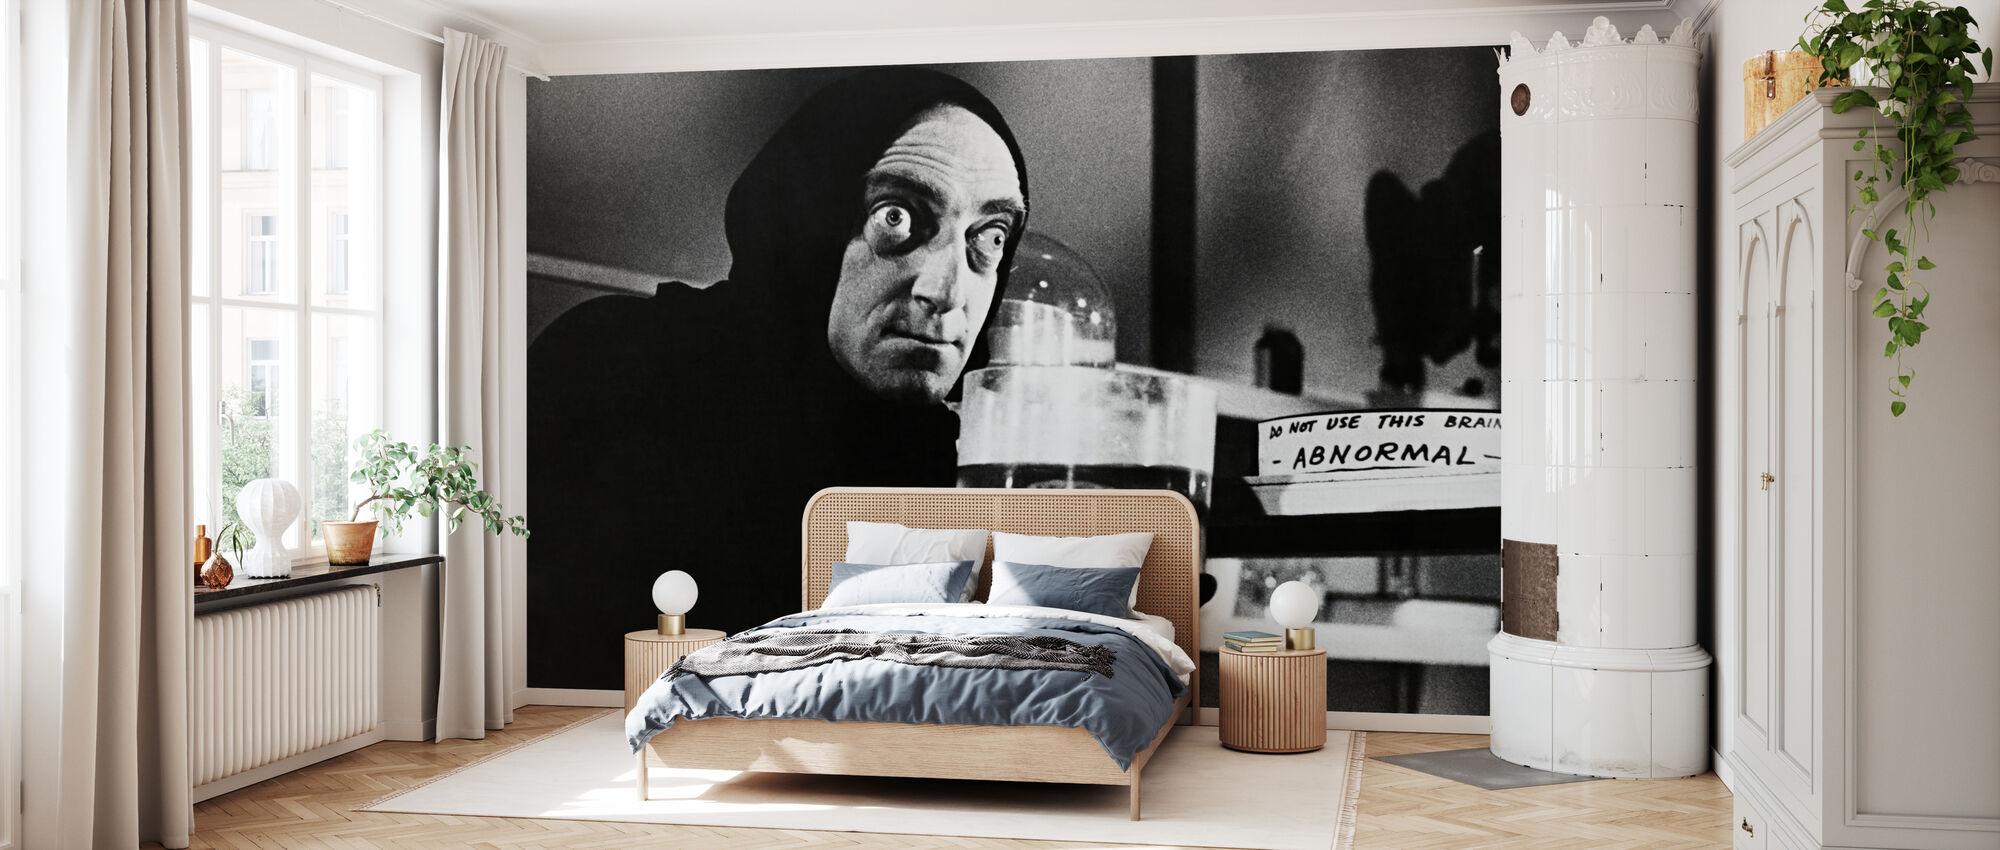 Joven Frankenstein - Marty Feldman - Papel pintado - Dormitorio